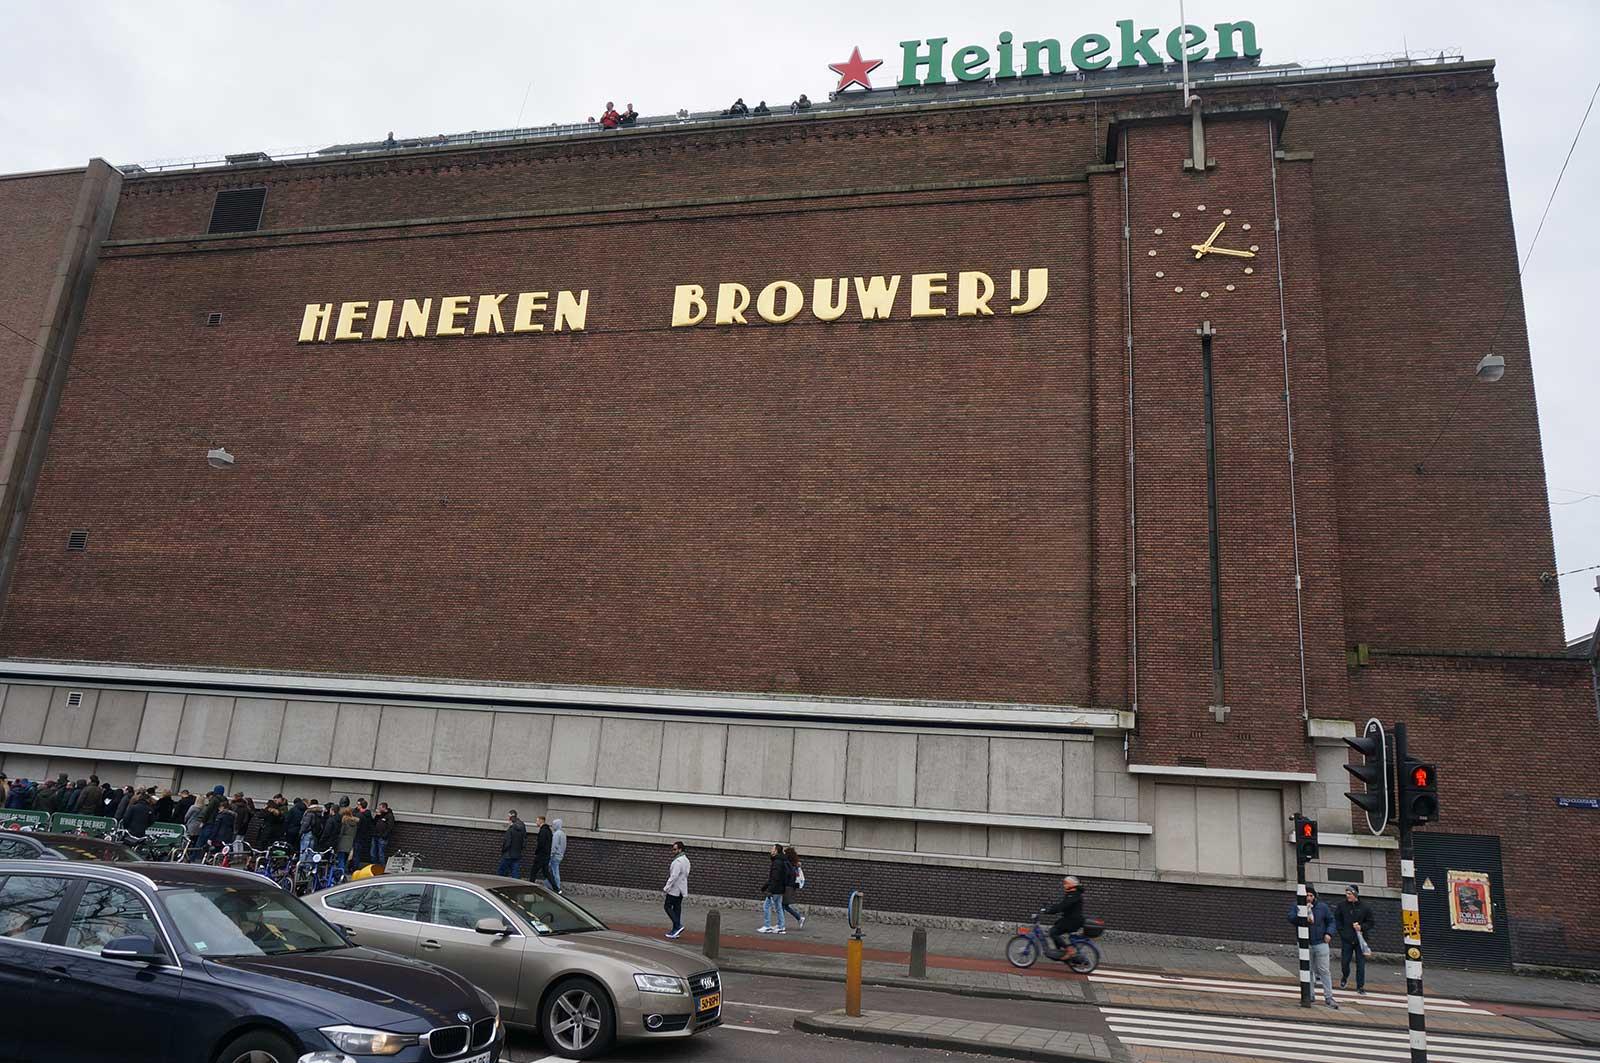 Heineken Experience - Heineken Fabrika - Heineken Brewery - Heineken Brouwery